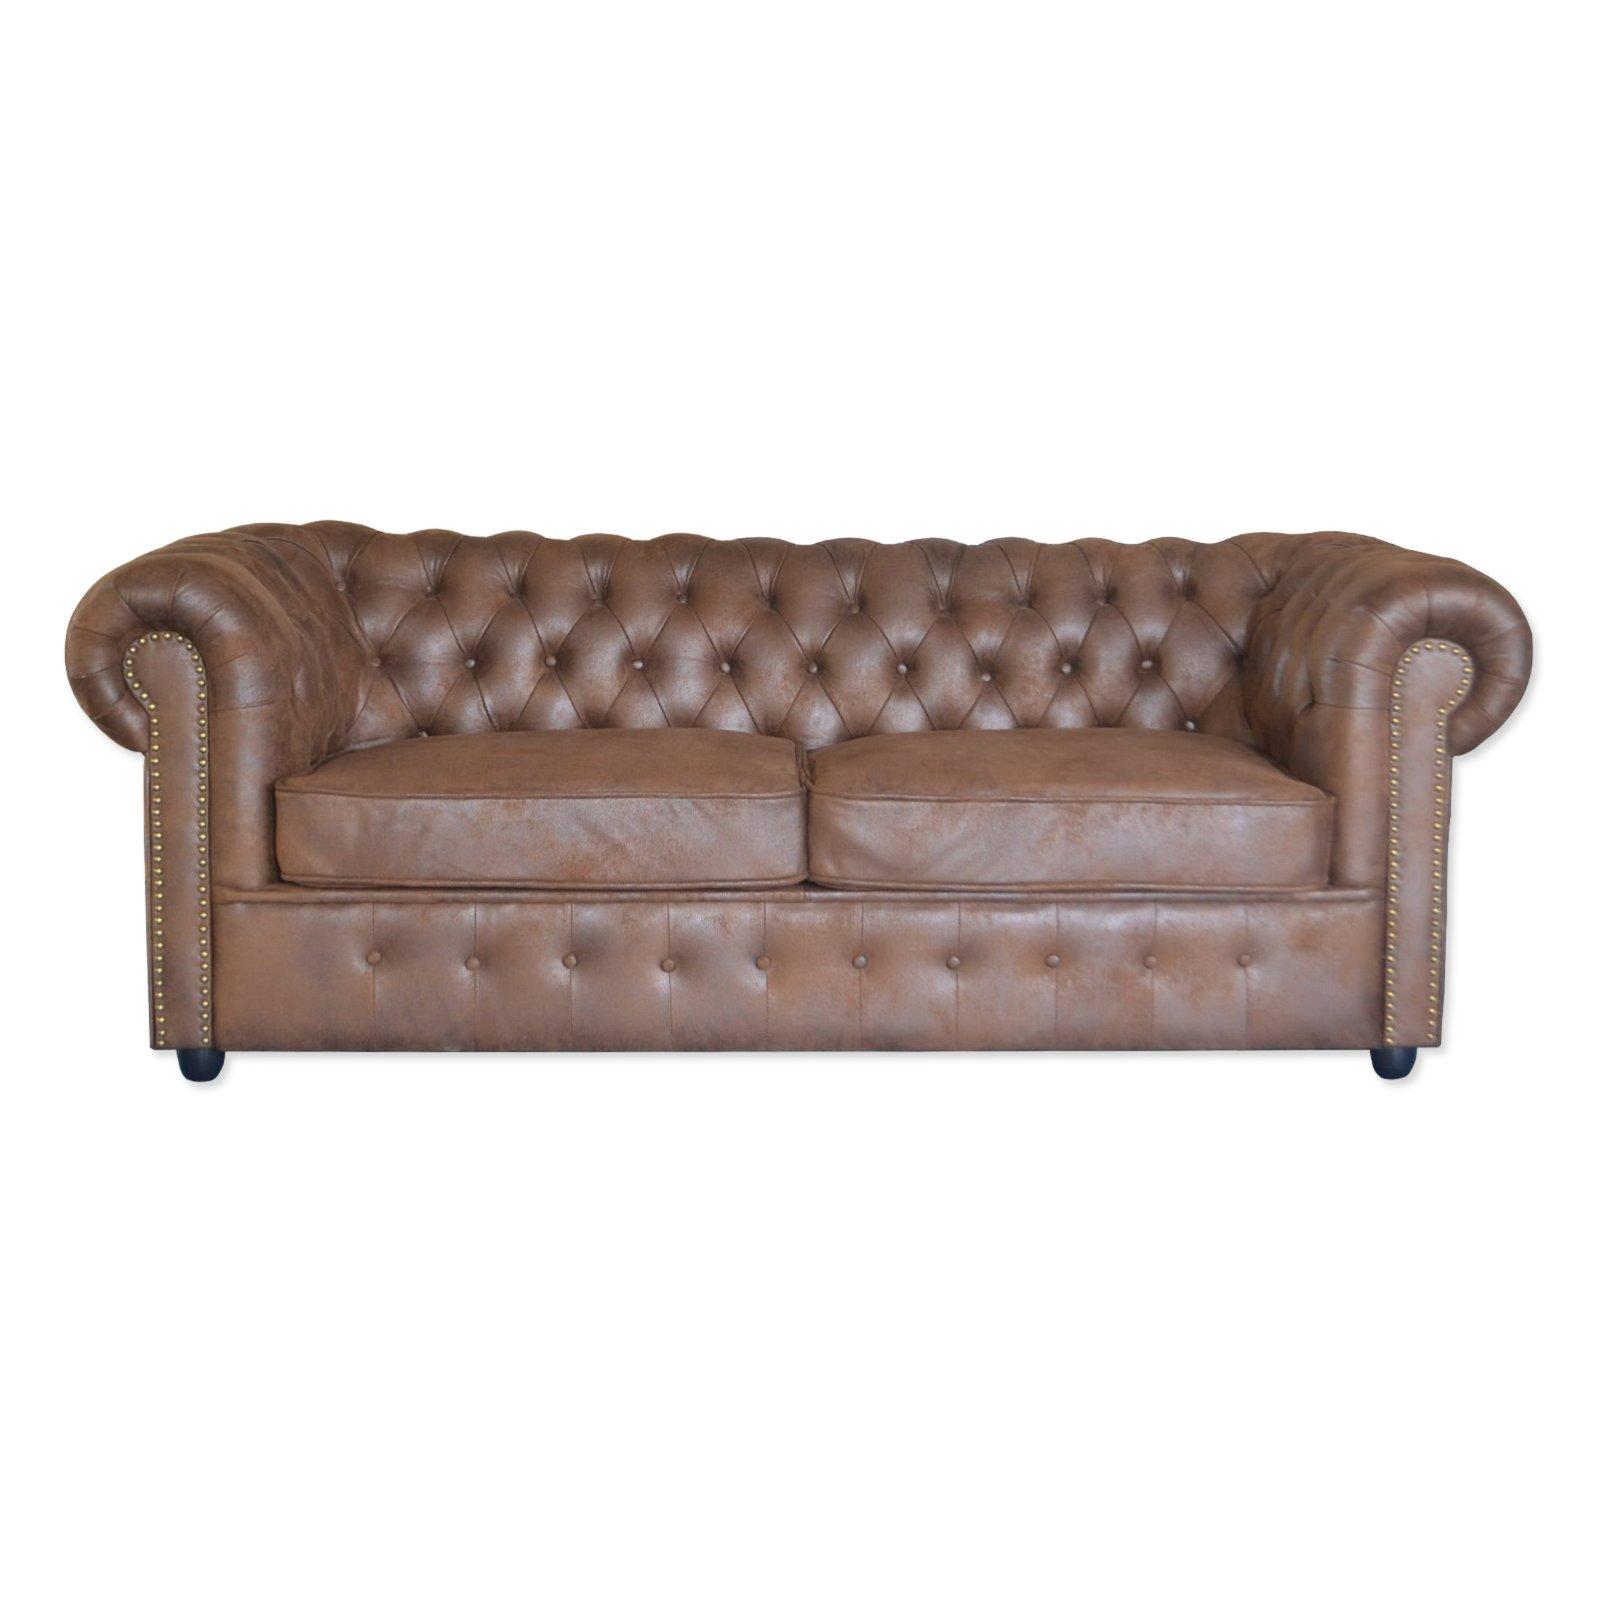 25 Sitzer Big Sofa Braun Vintage Microfaser 211 Cm Big